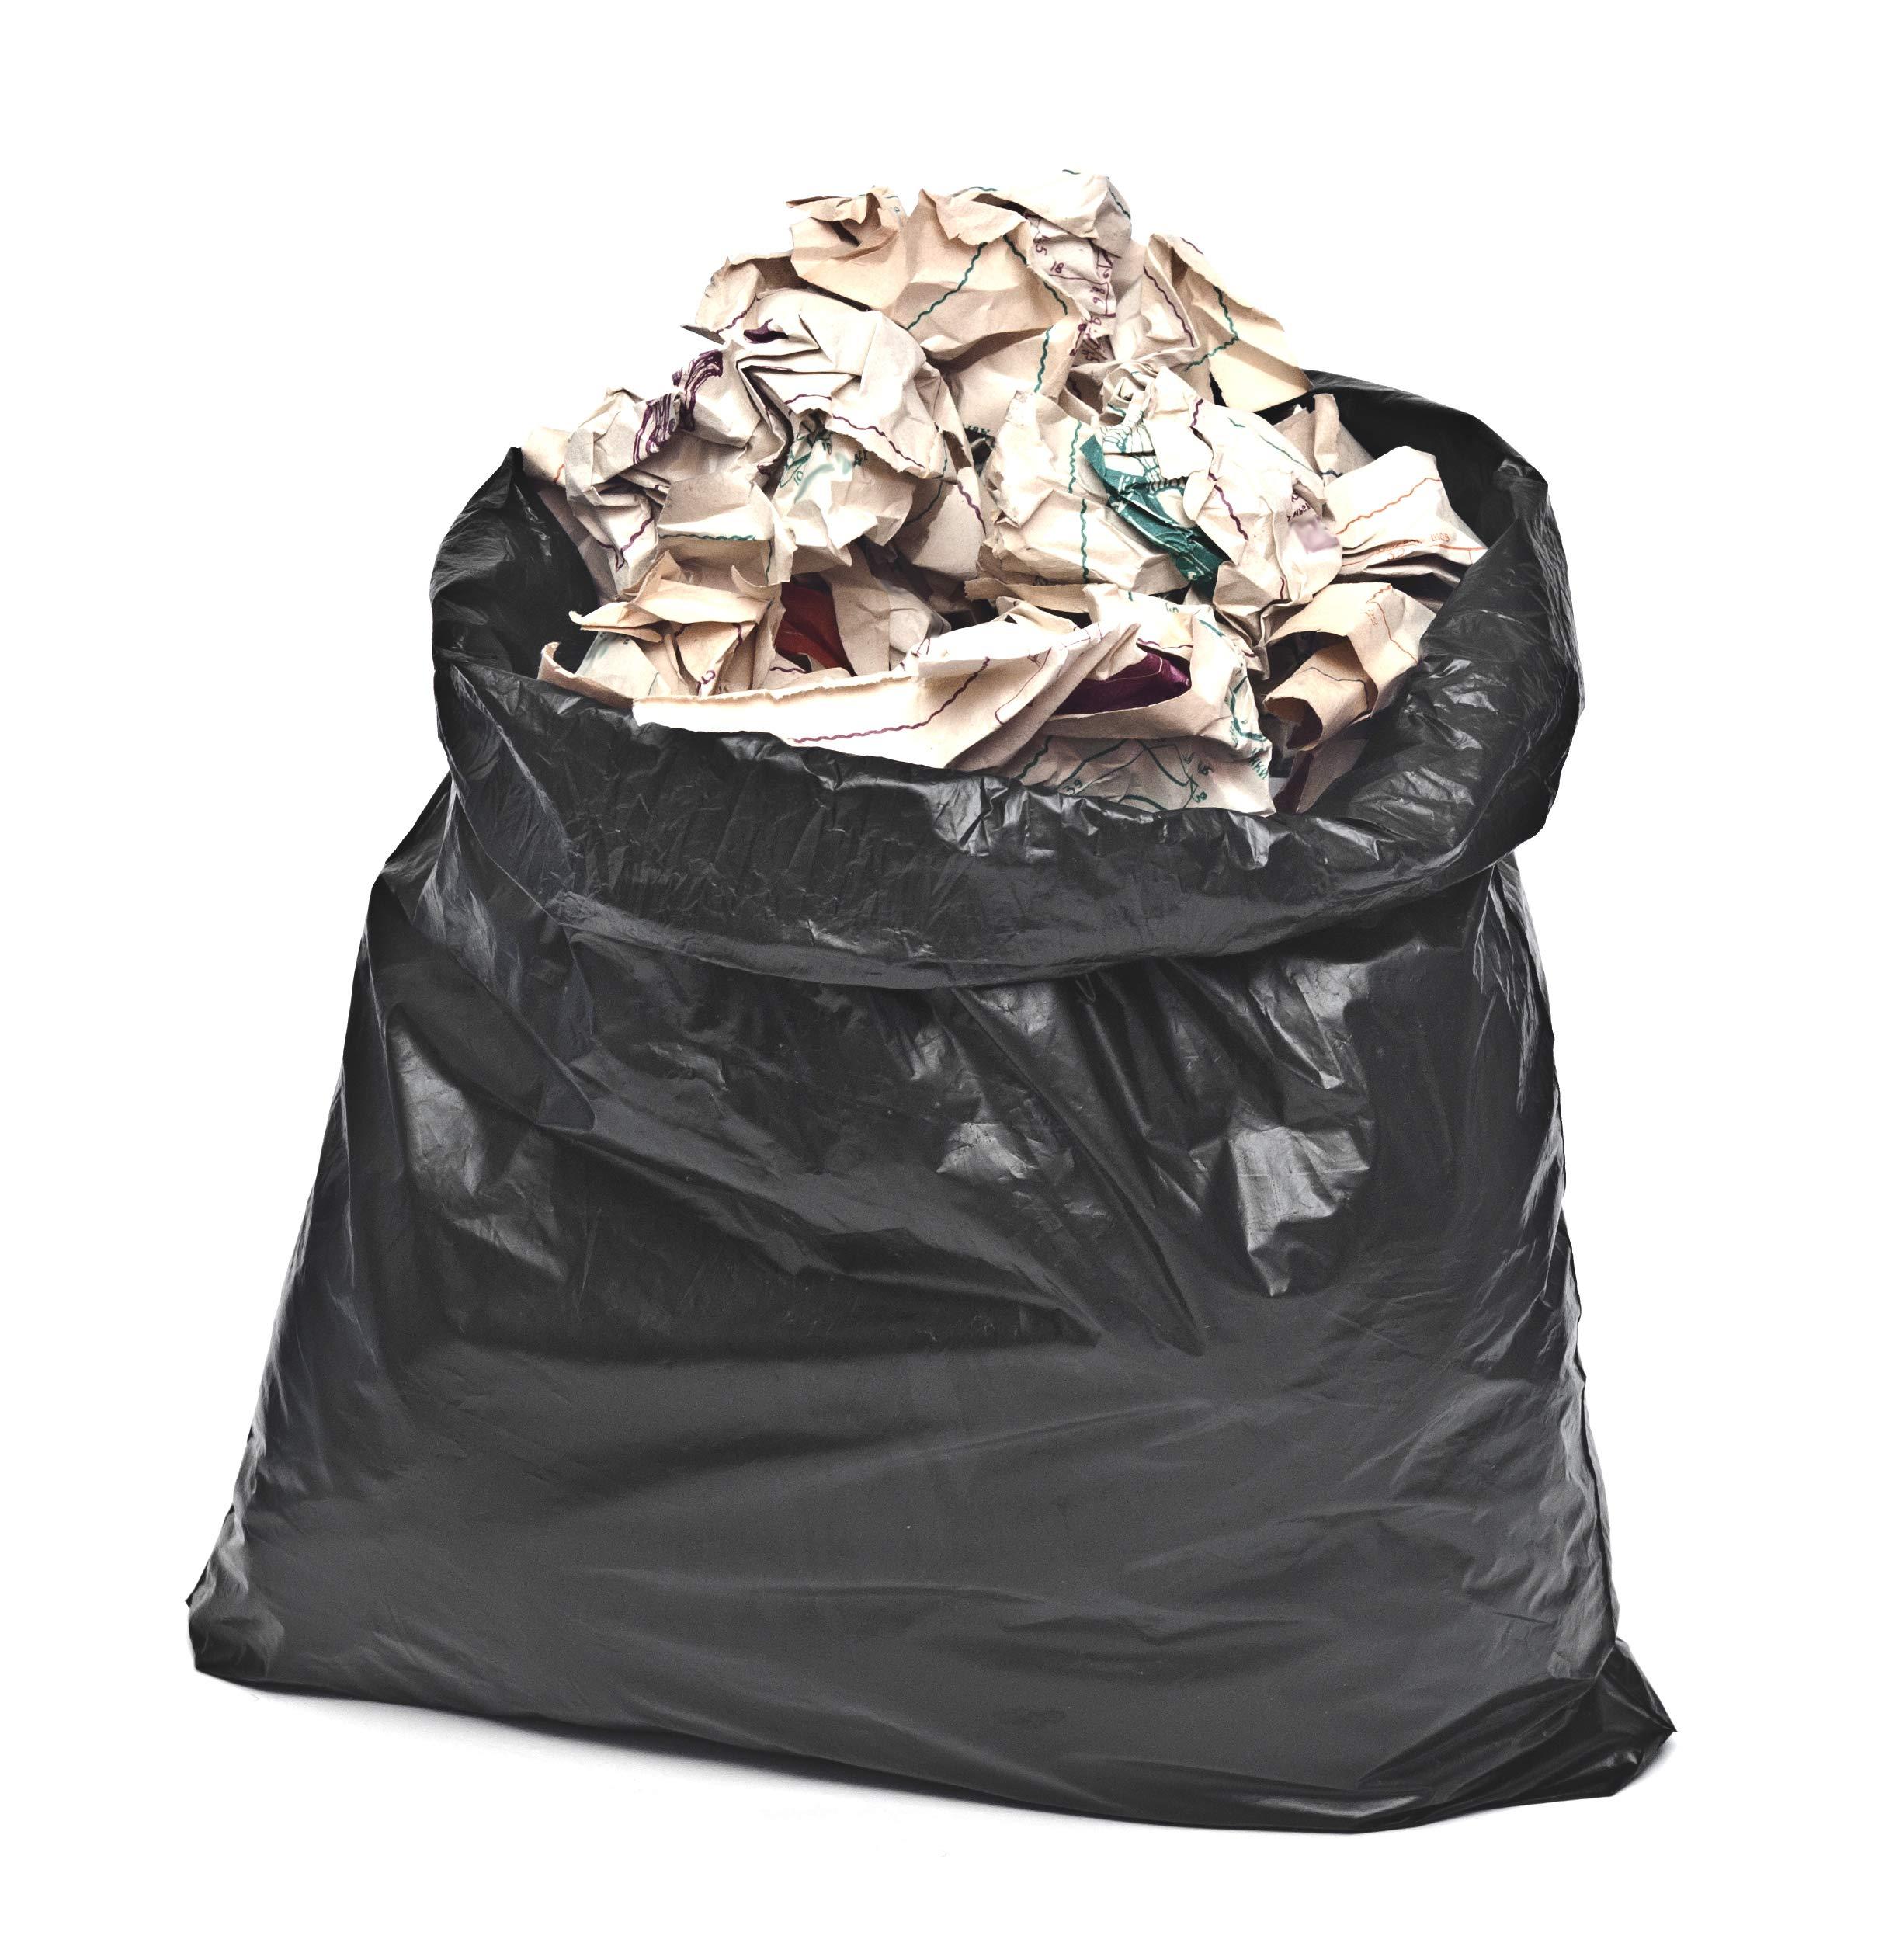 Toughbag 95 Gal Trash bags, Black, 2 Mil, 61x68, 25 Garbage Bags Per Case by ToughBag (Image #4)